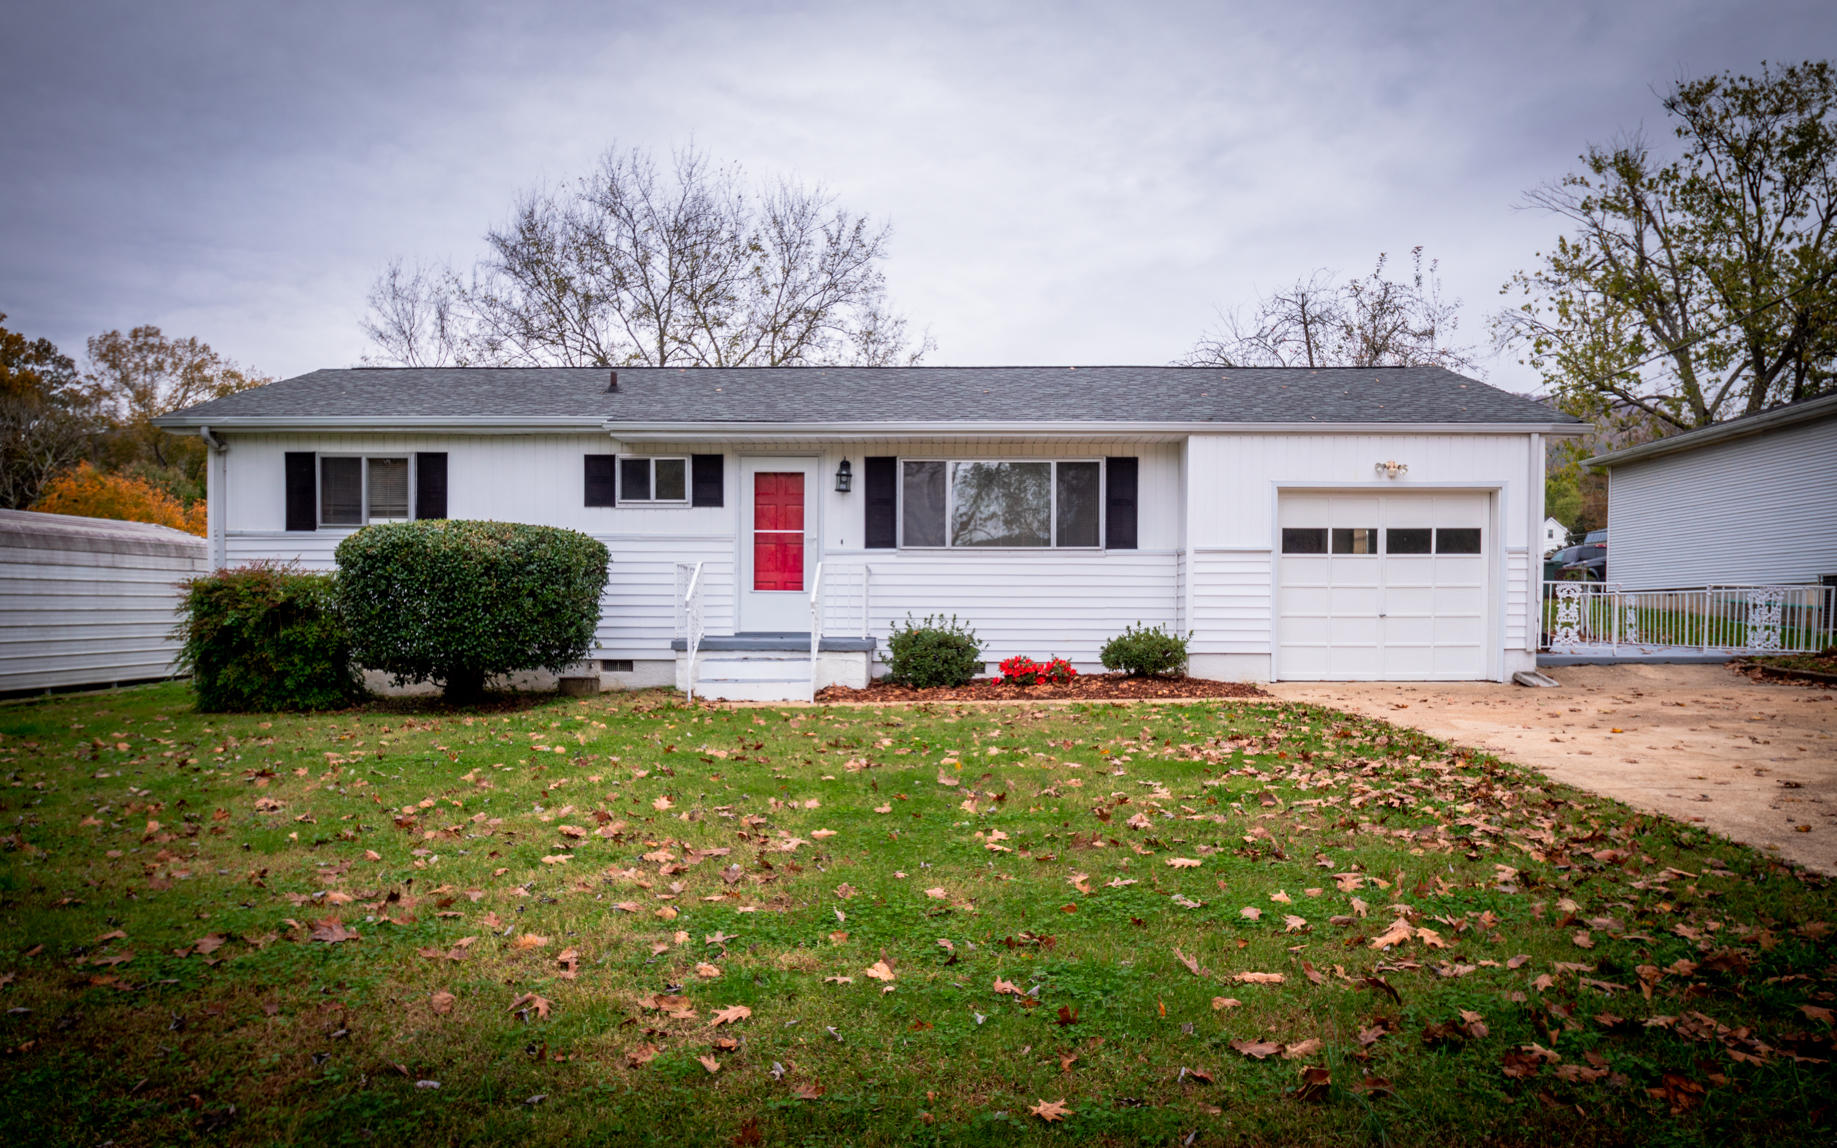 363 Carnation St, Chattanooga, TN 37419